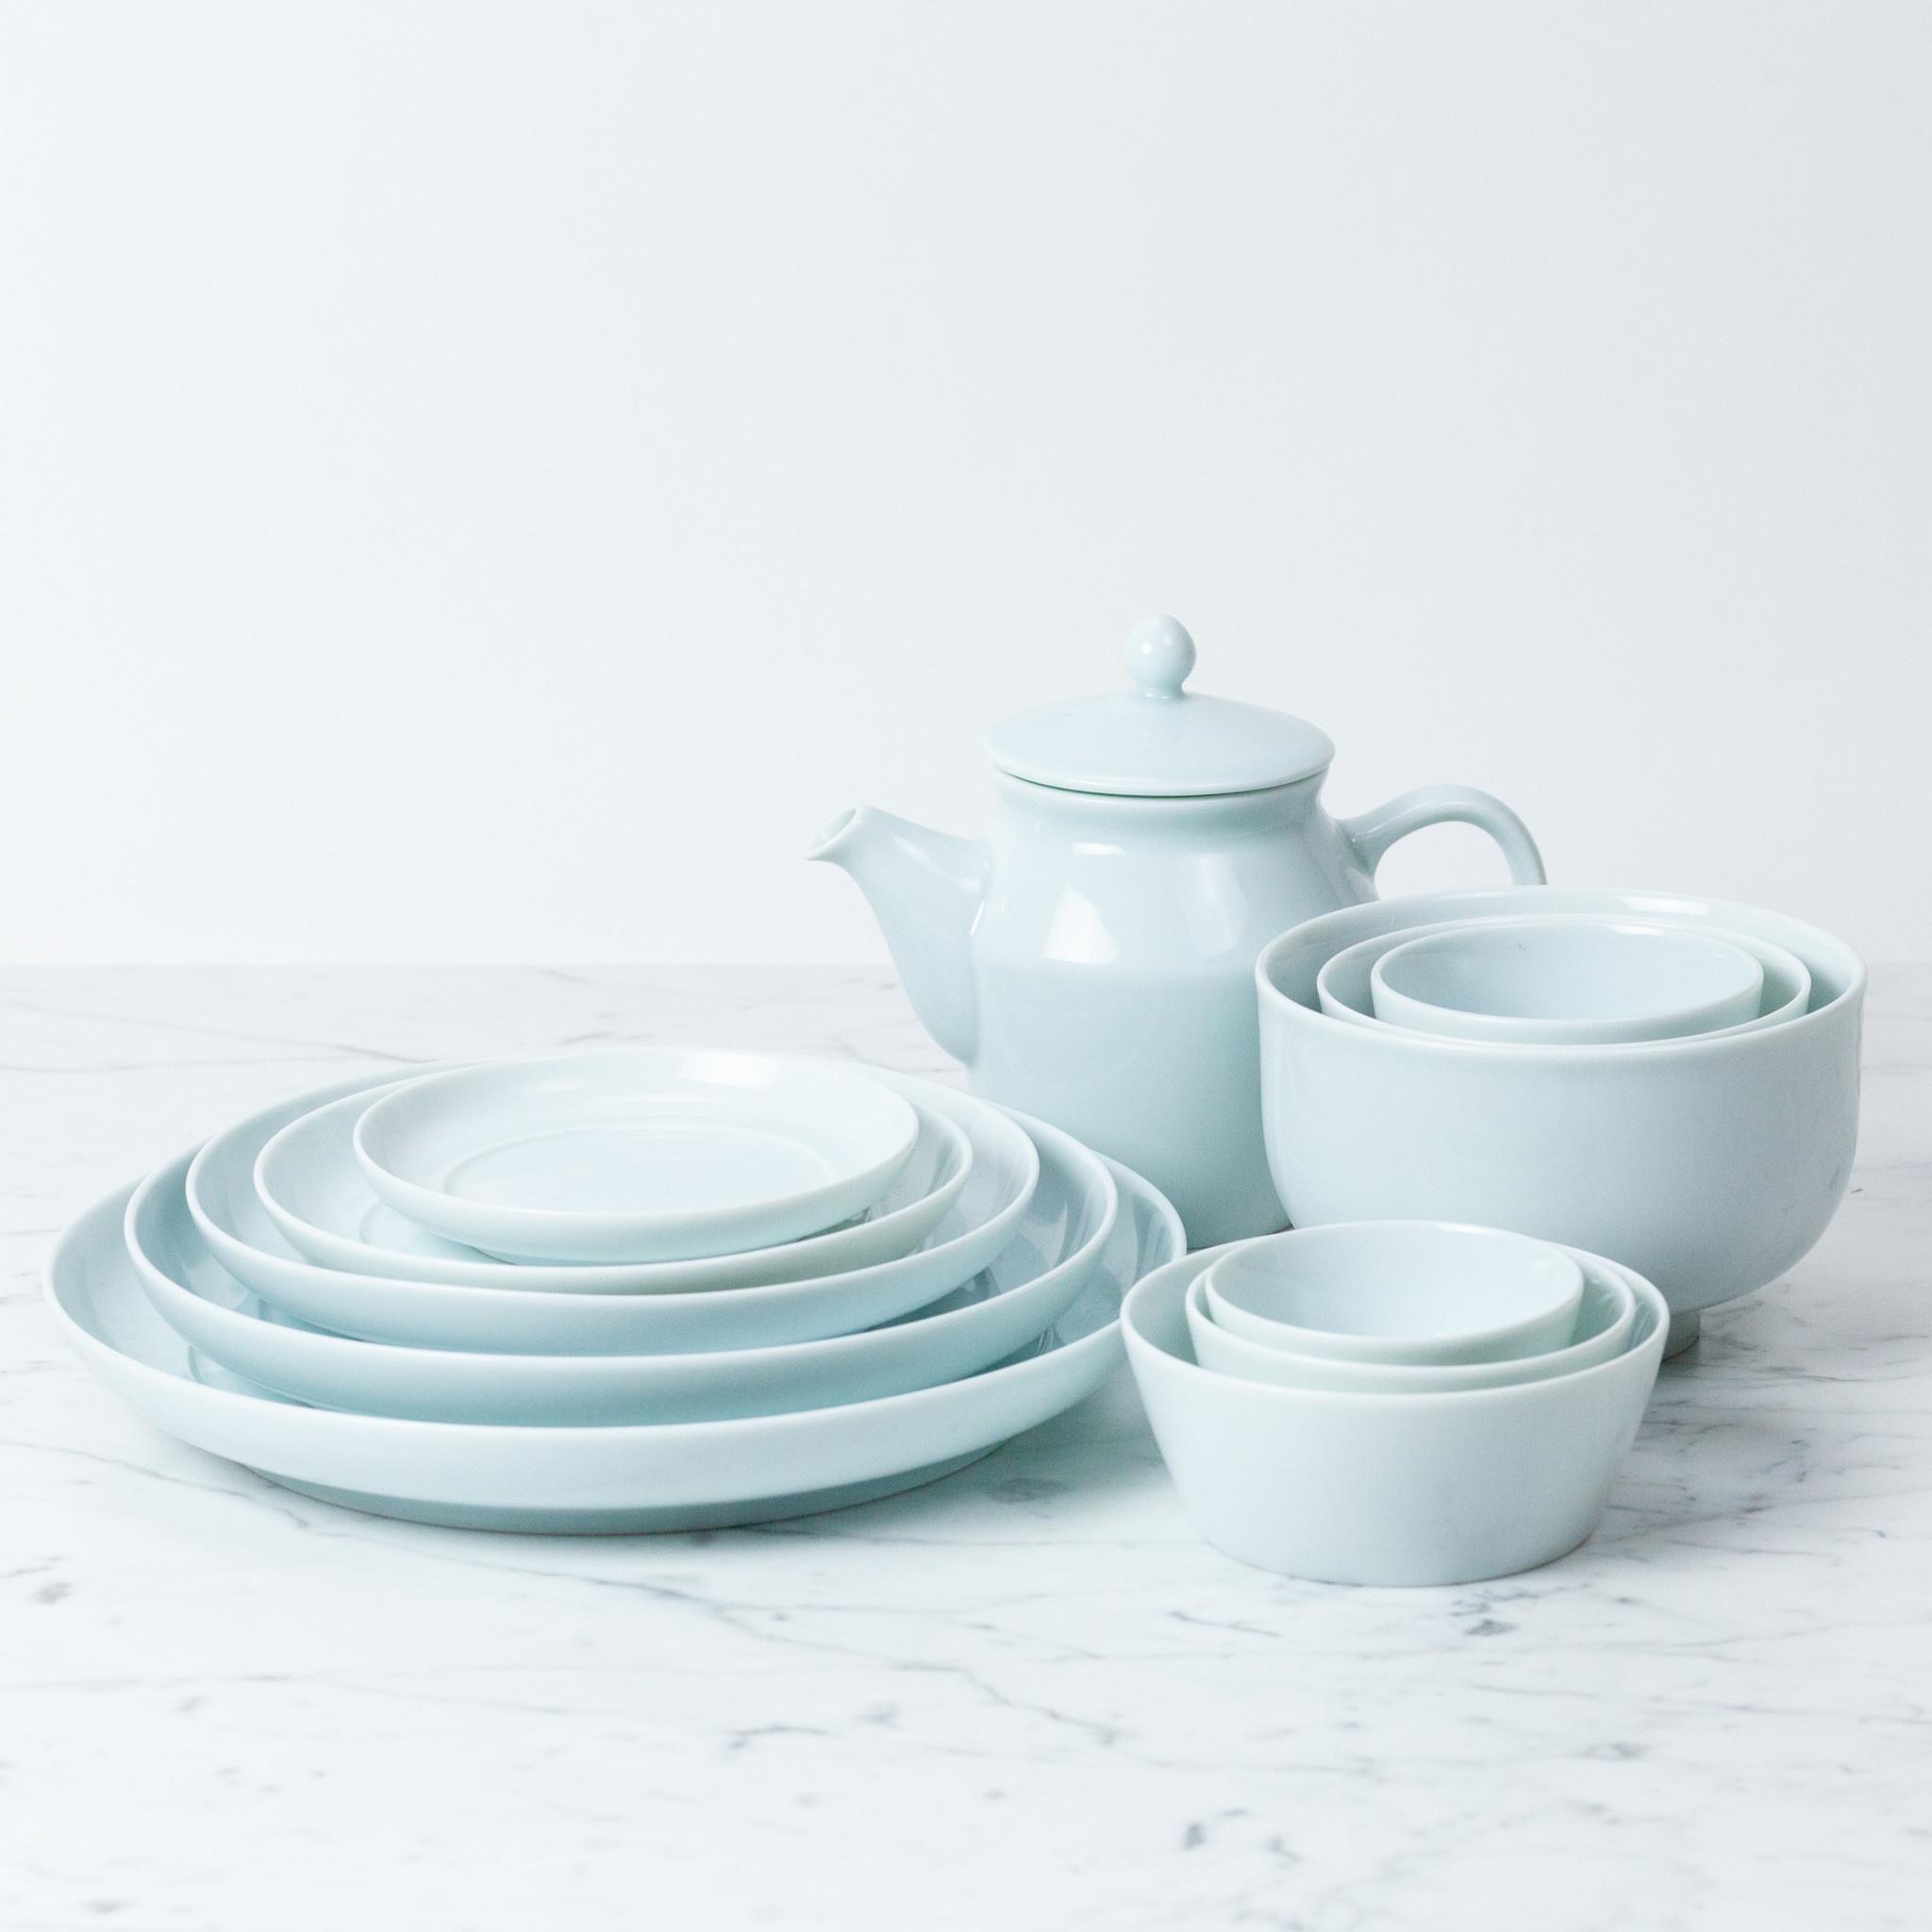 MIZU MIZU mizu-mizu Simple Porcelain Bowl - Bluish White - Large - 4.5''